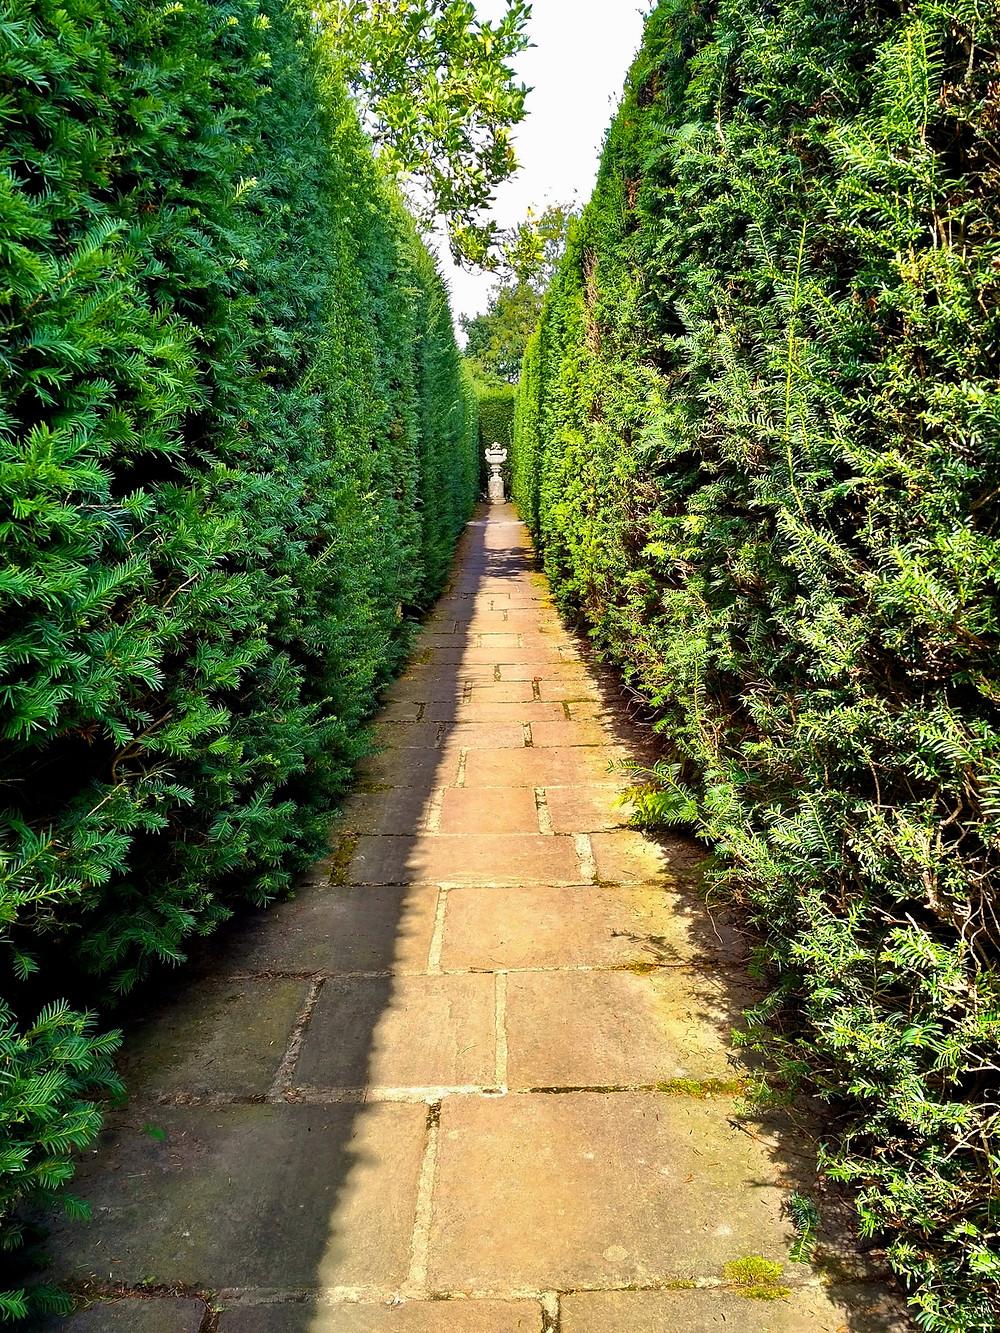 Statuary amidst tall hedges at Sissinghurst Castle